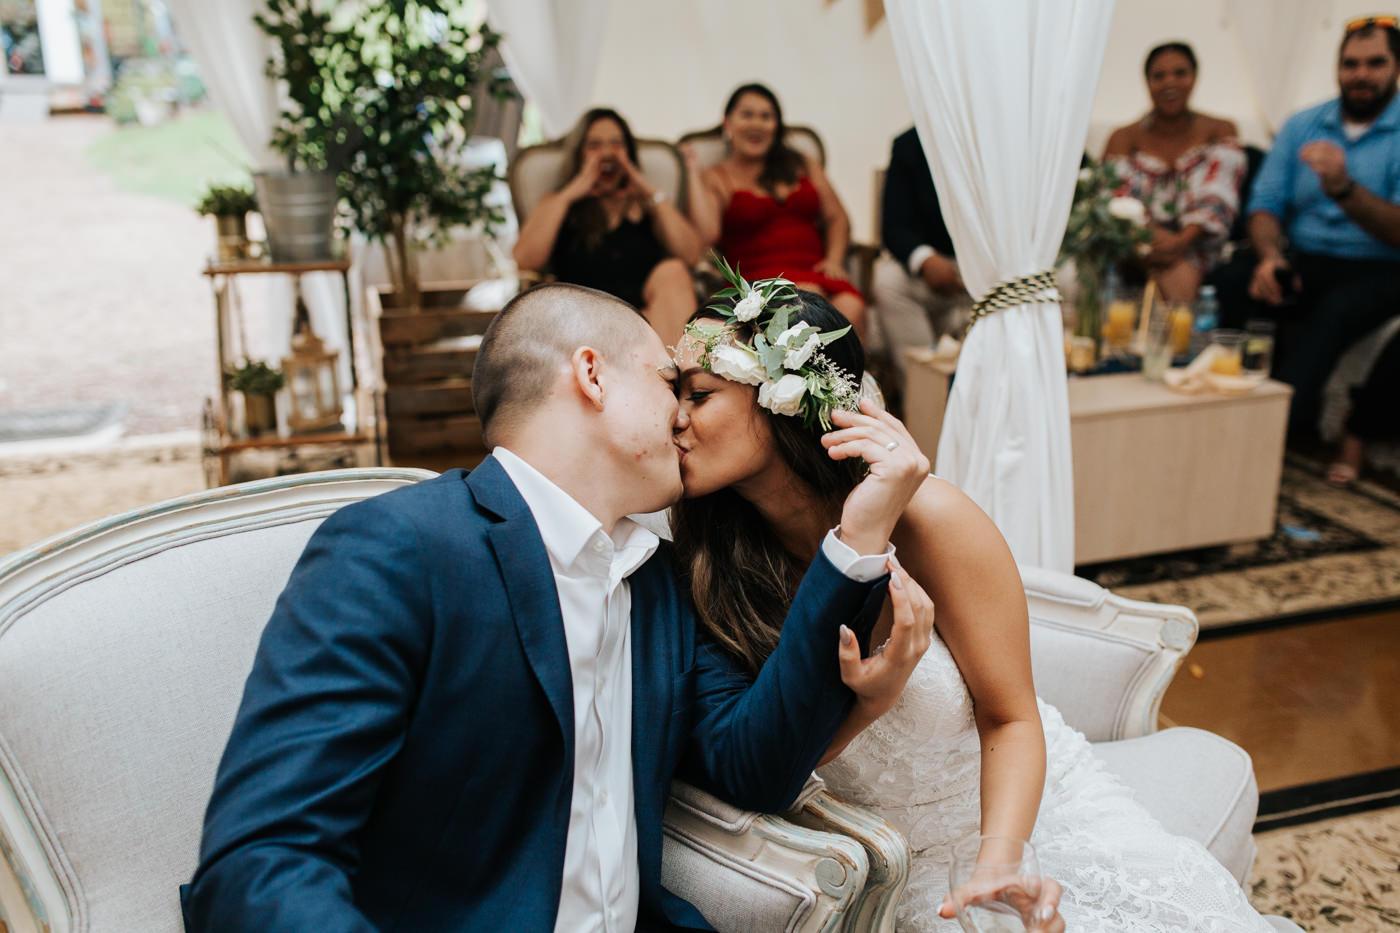 Nick & Vanezza - Fernbank Farm Wedding - Samantha Heather Photography-141.jpg